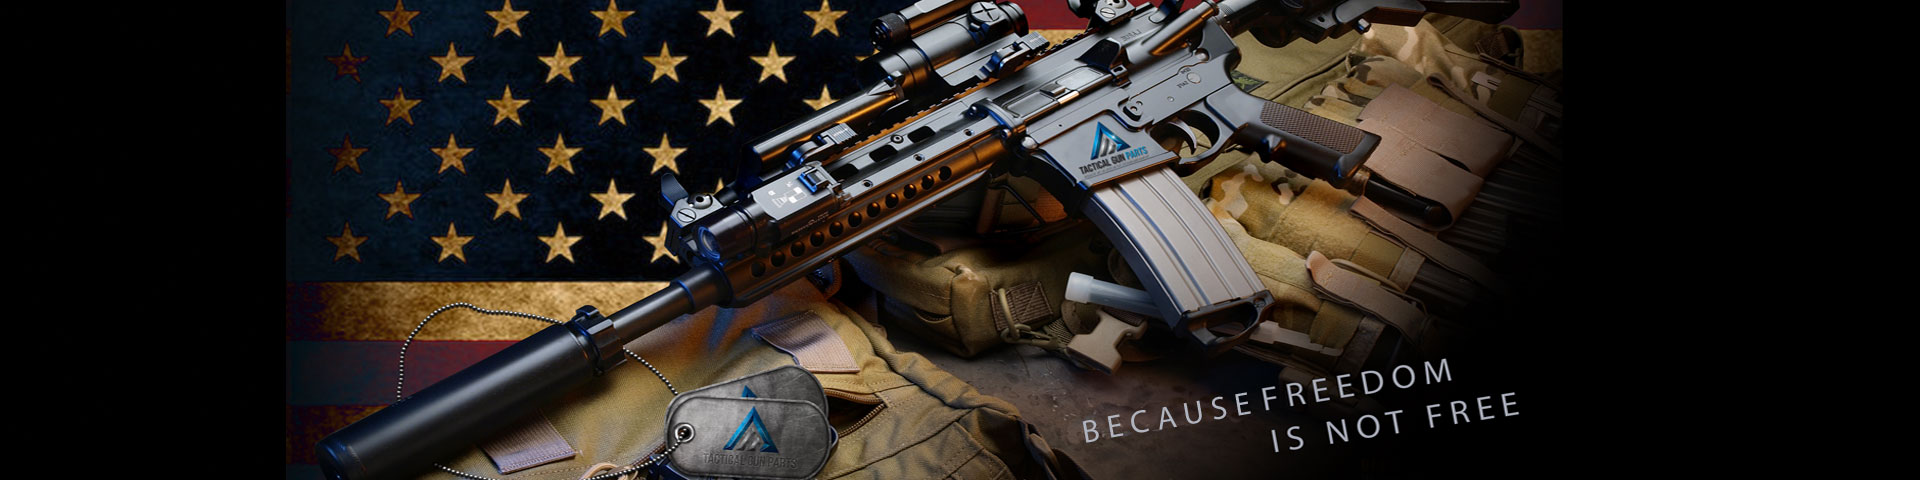 Tactical Gun Parts   AR-15, Glock, AR-10 and 1911 gun parts